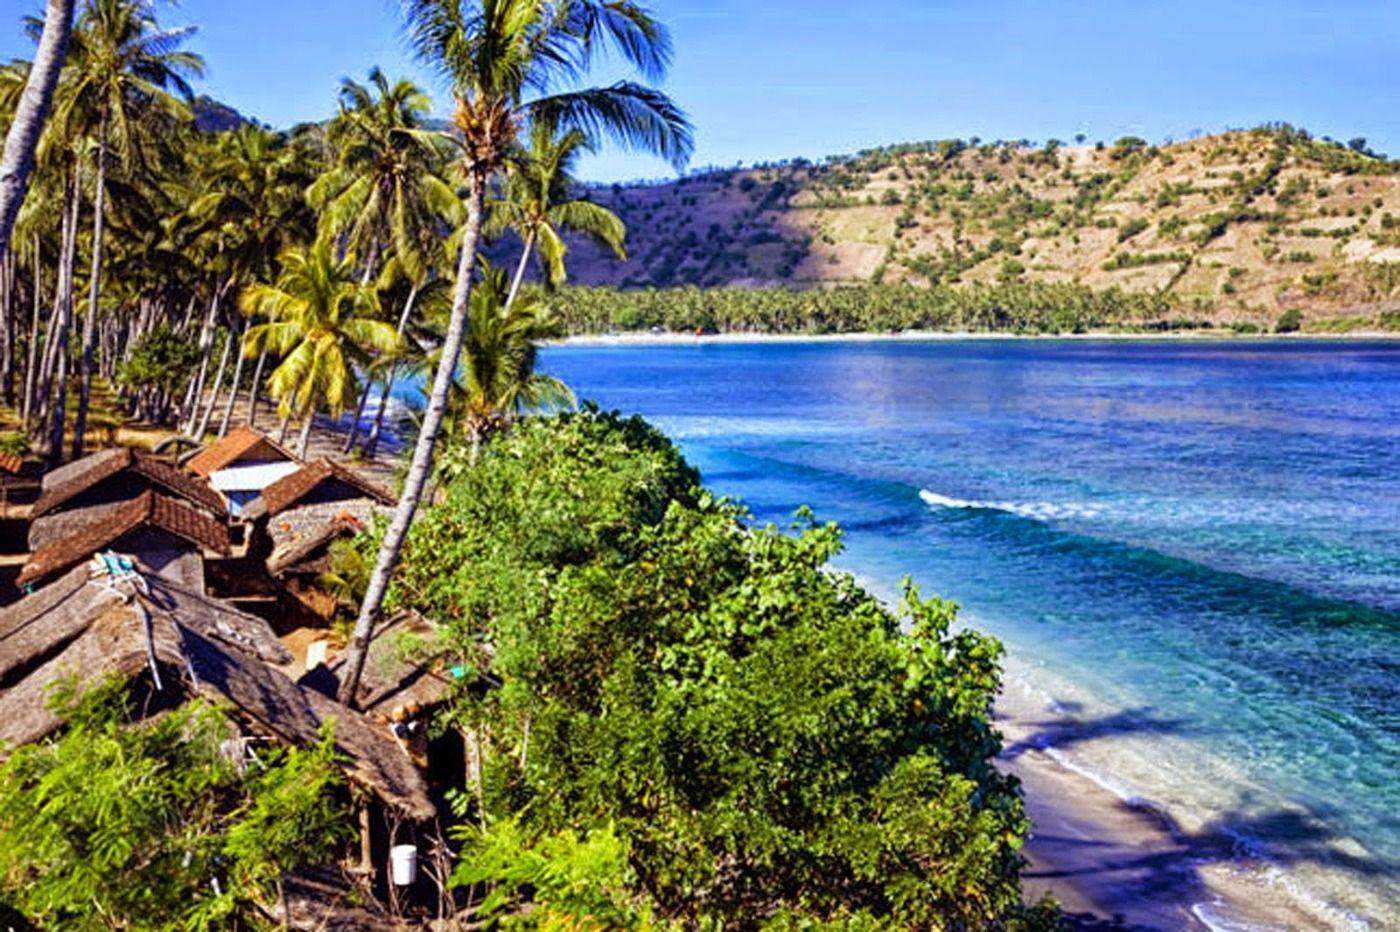 Pantai Sire Medana Memiliki Keindahan Menawan Wisata Lombok Utara Kab